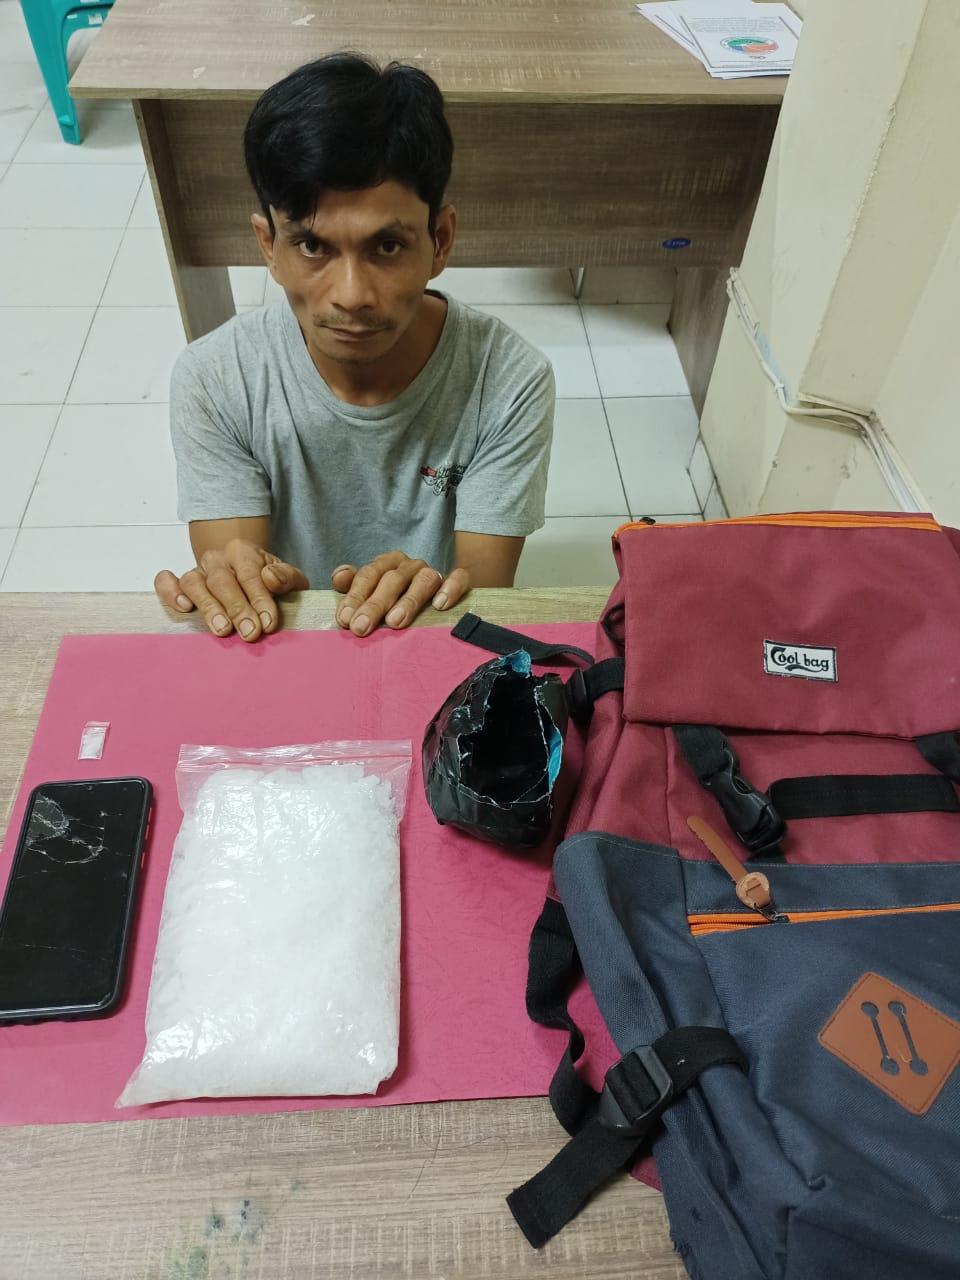 Diduga Narkoba Jenis Sabu Setengah Kilo, Pria Paruh Baya Ditangkap Satresnarkoba Polres Siak